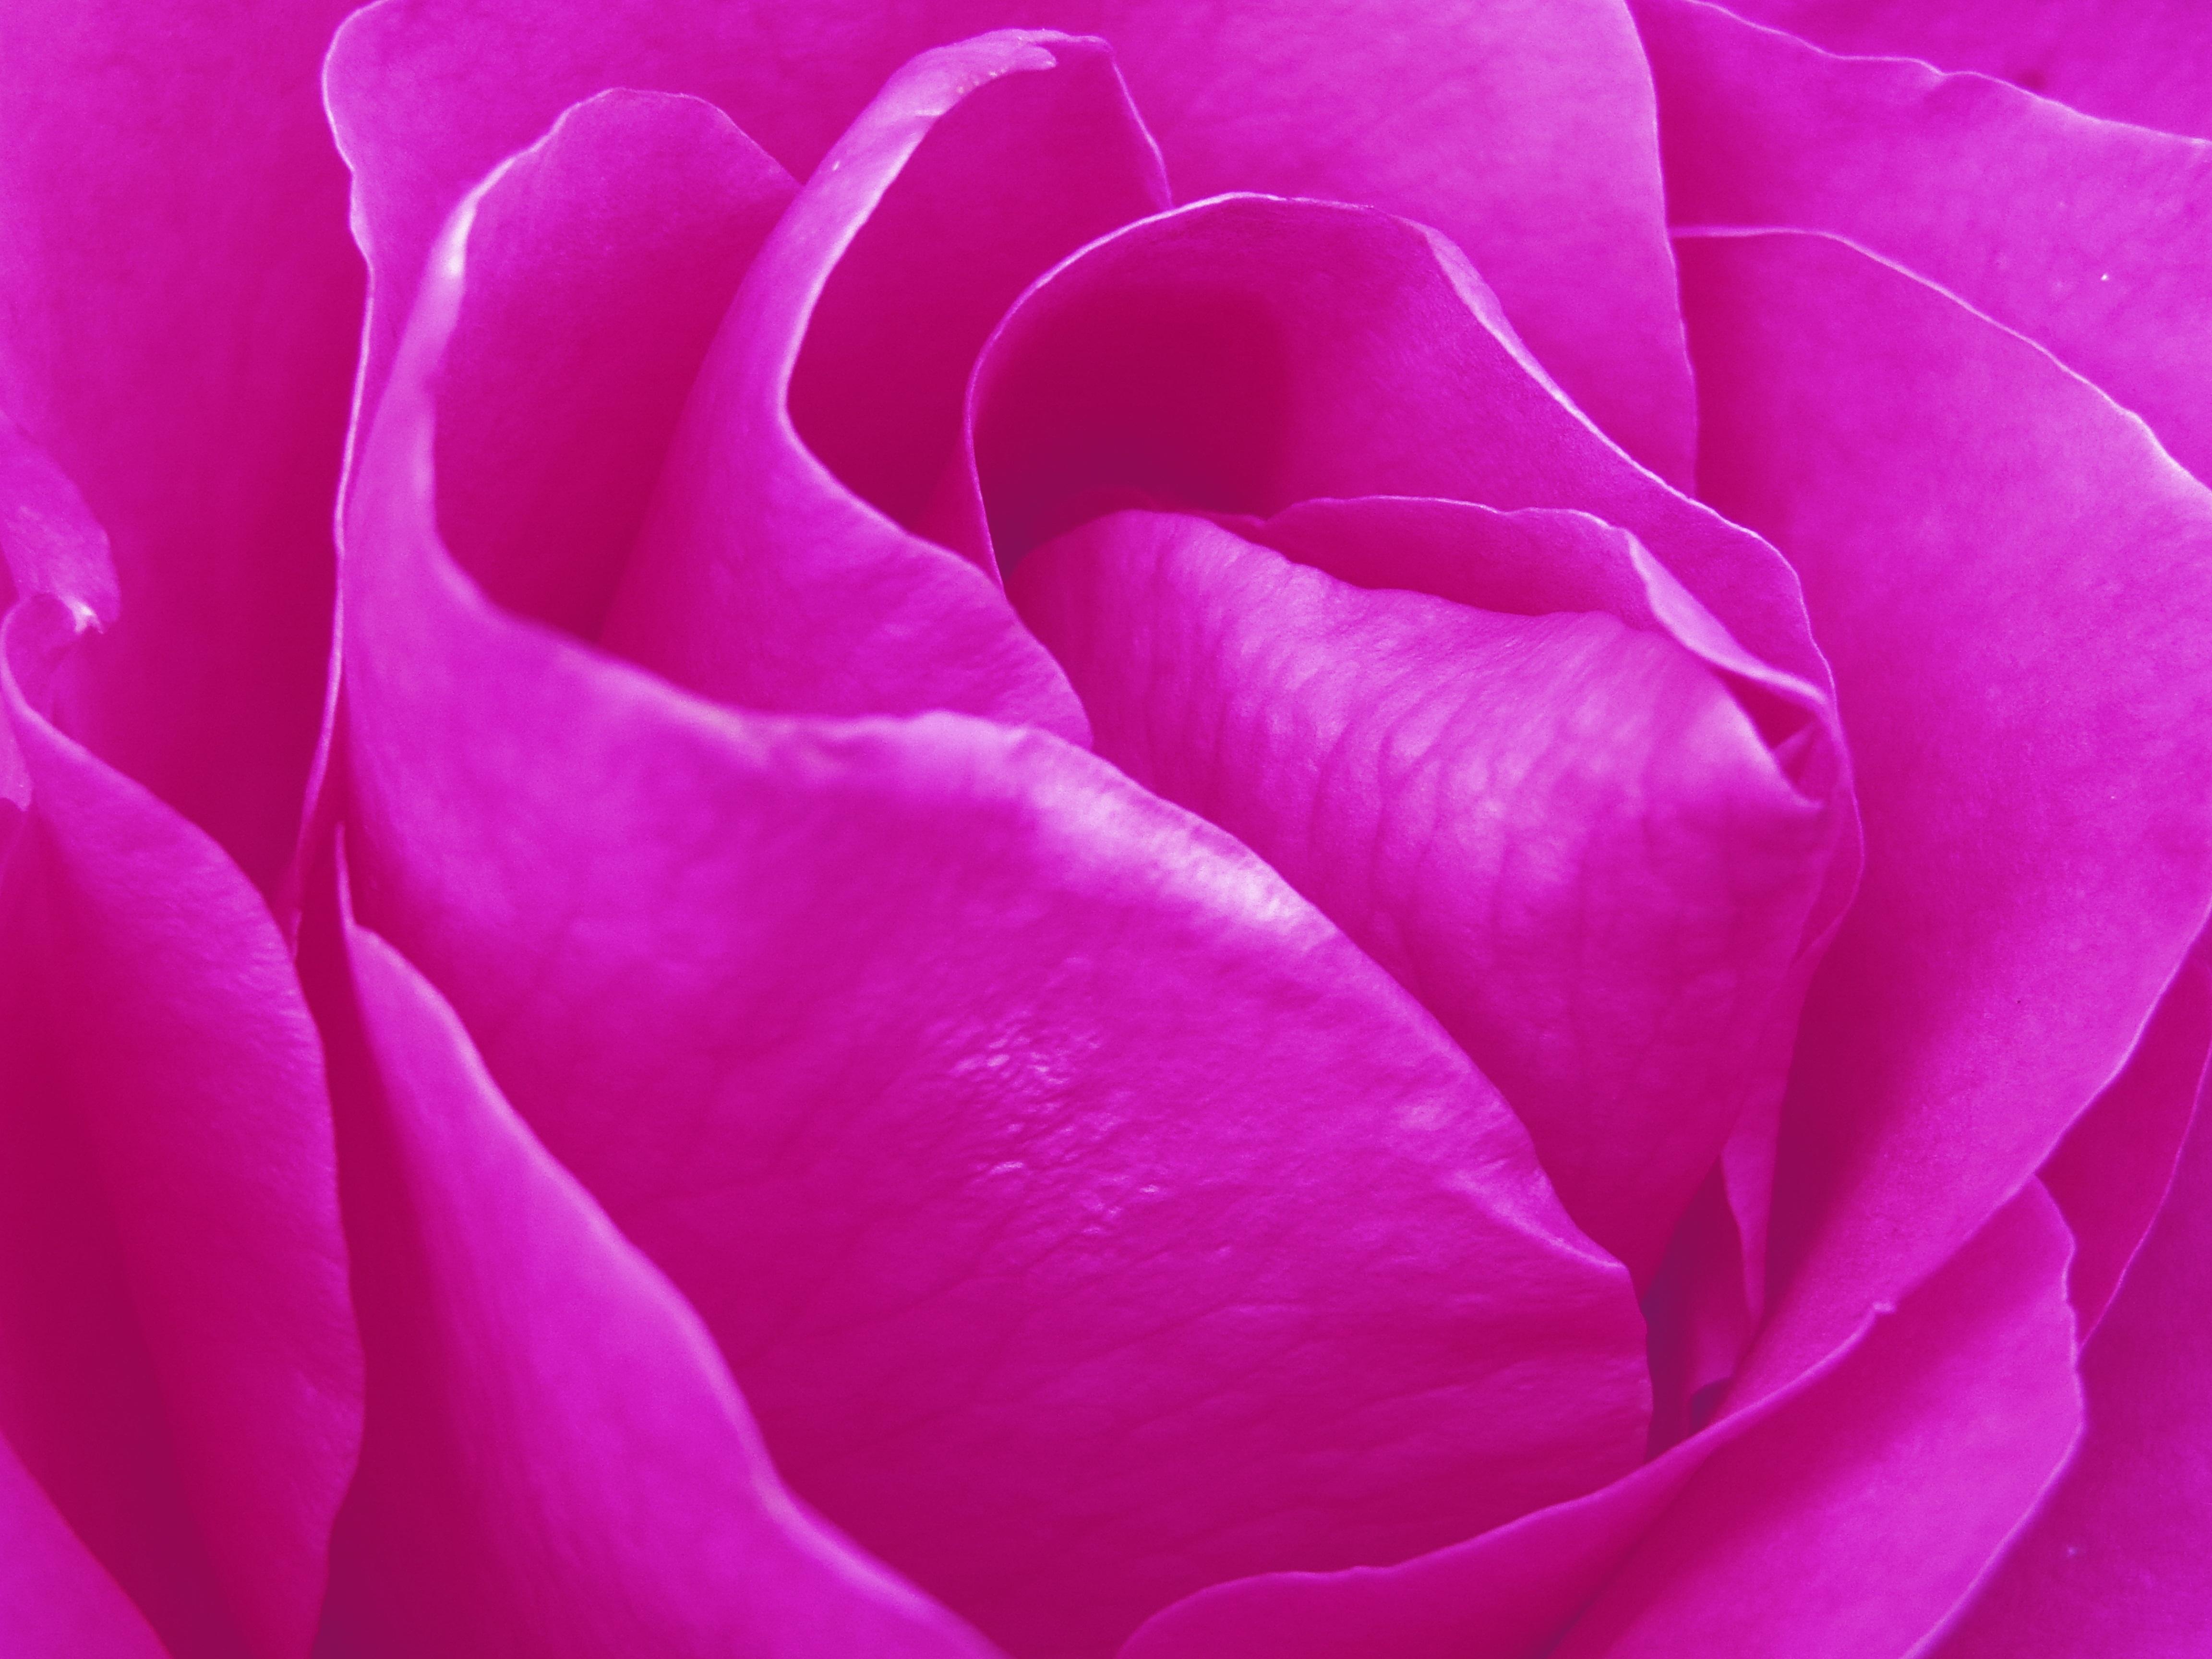 free images nature texture flower petal tulip decoration